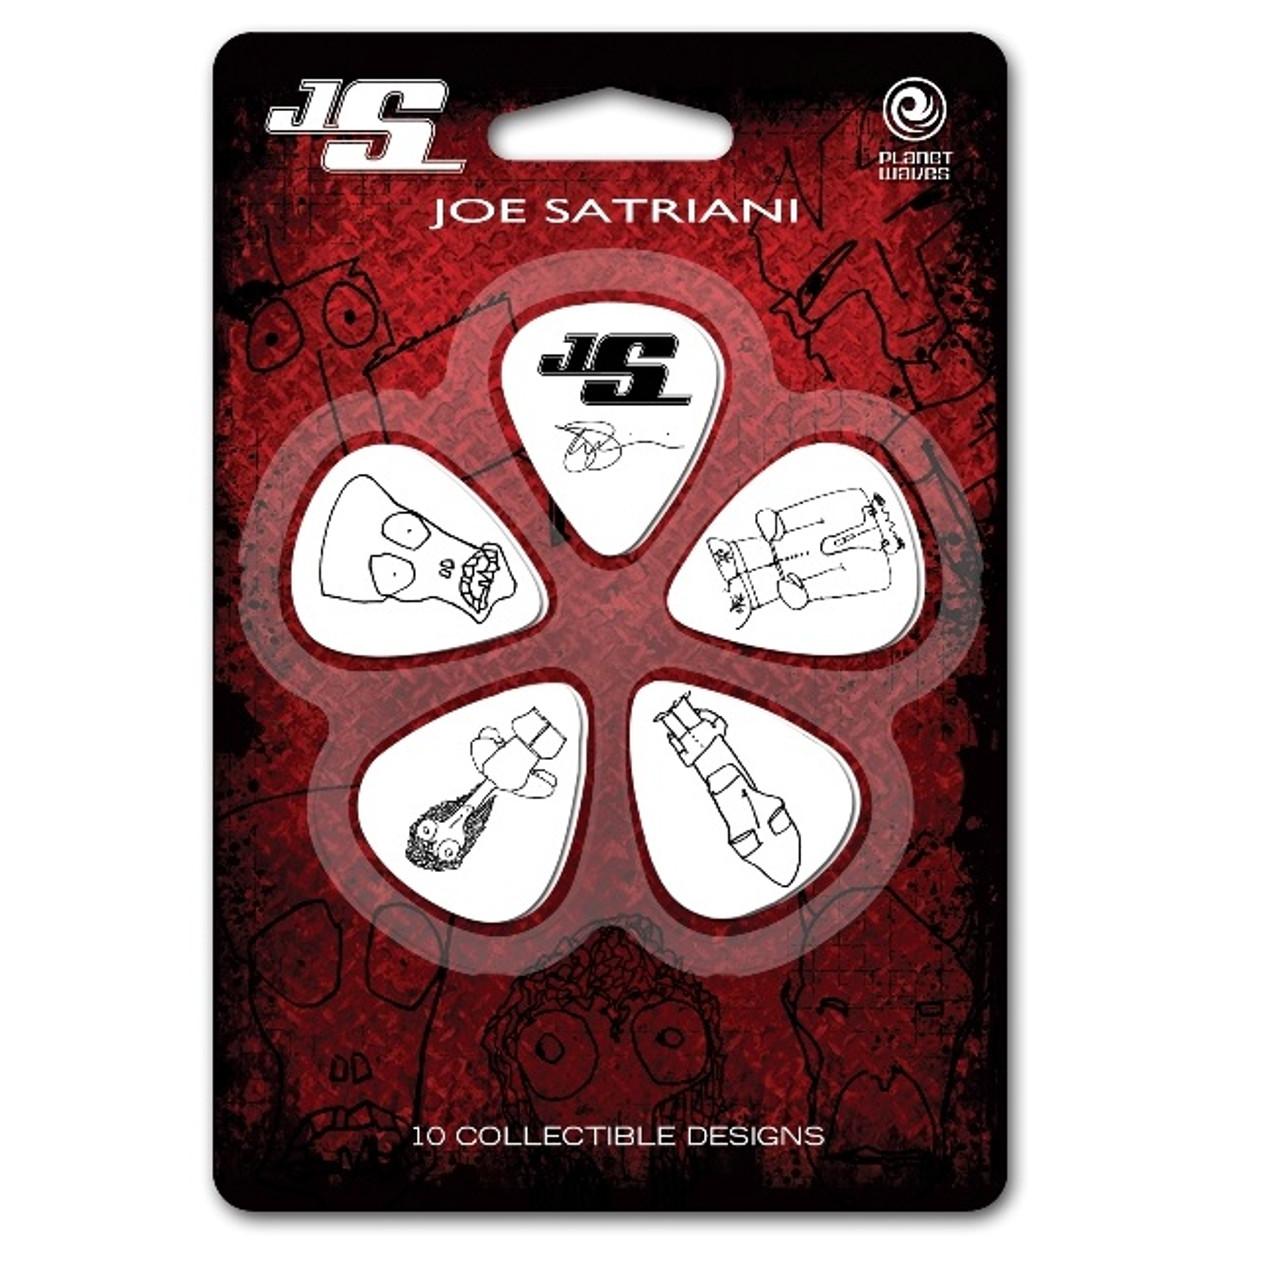 Planet Waves Joe Satriani Guitar Picks Black Light 10 Pack